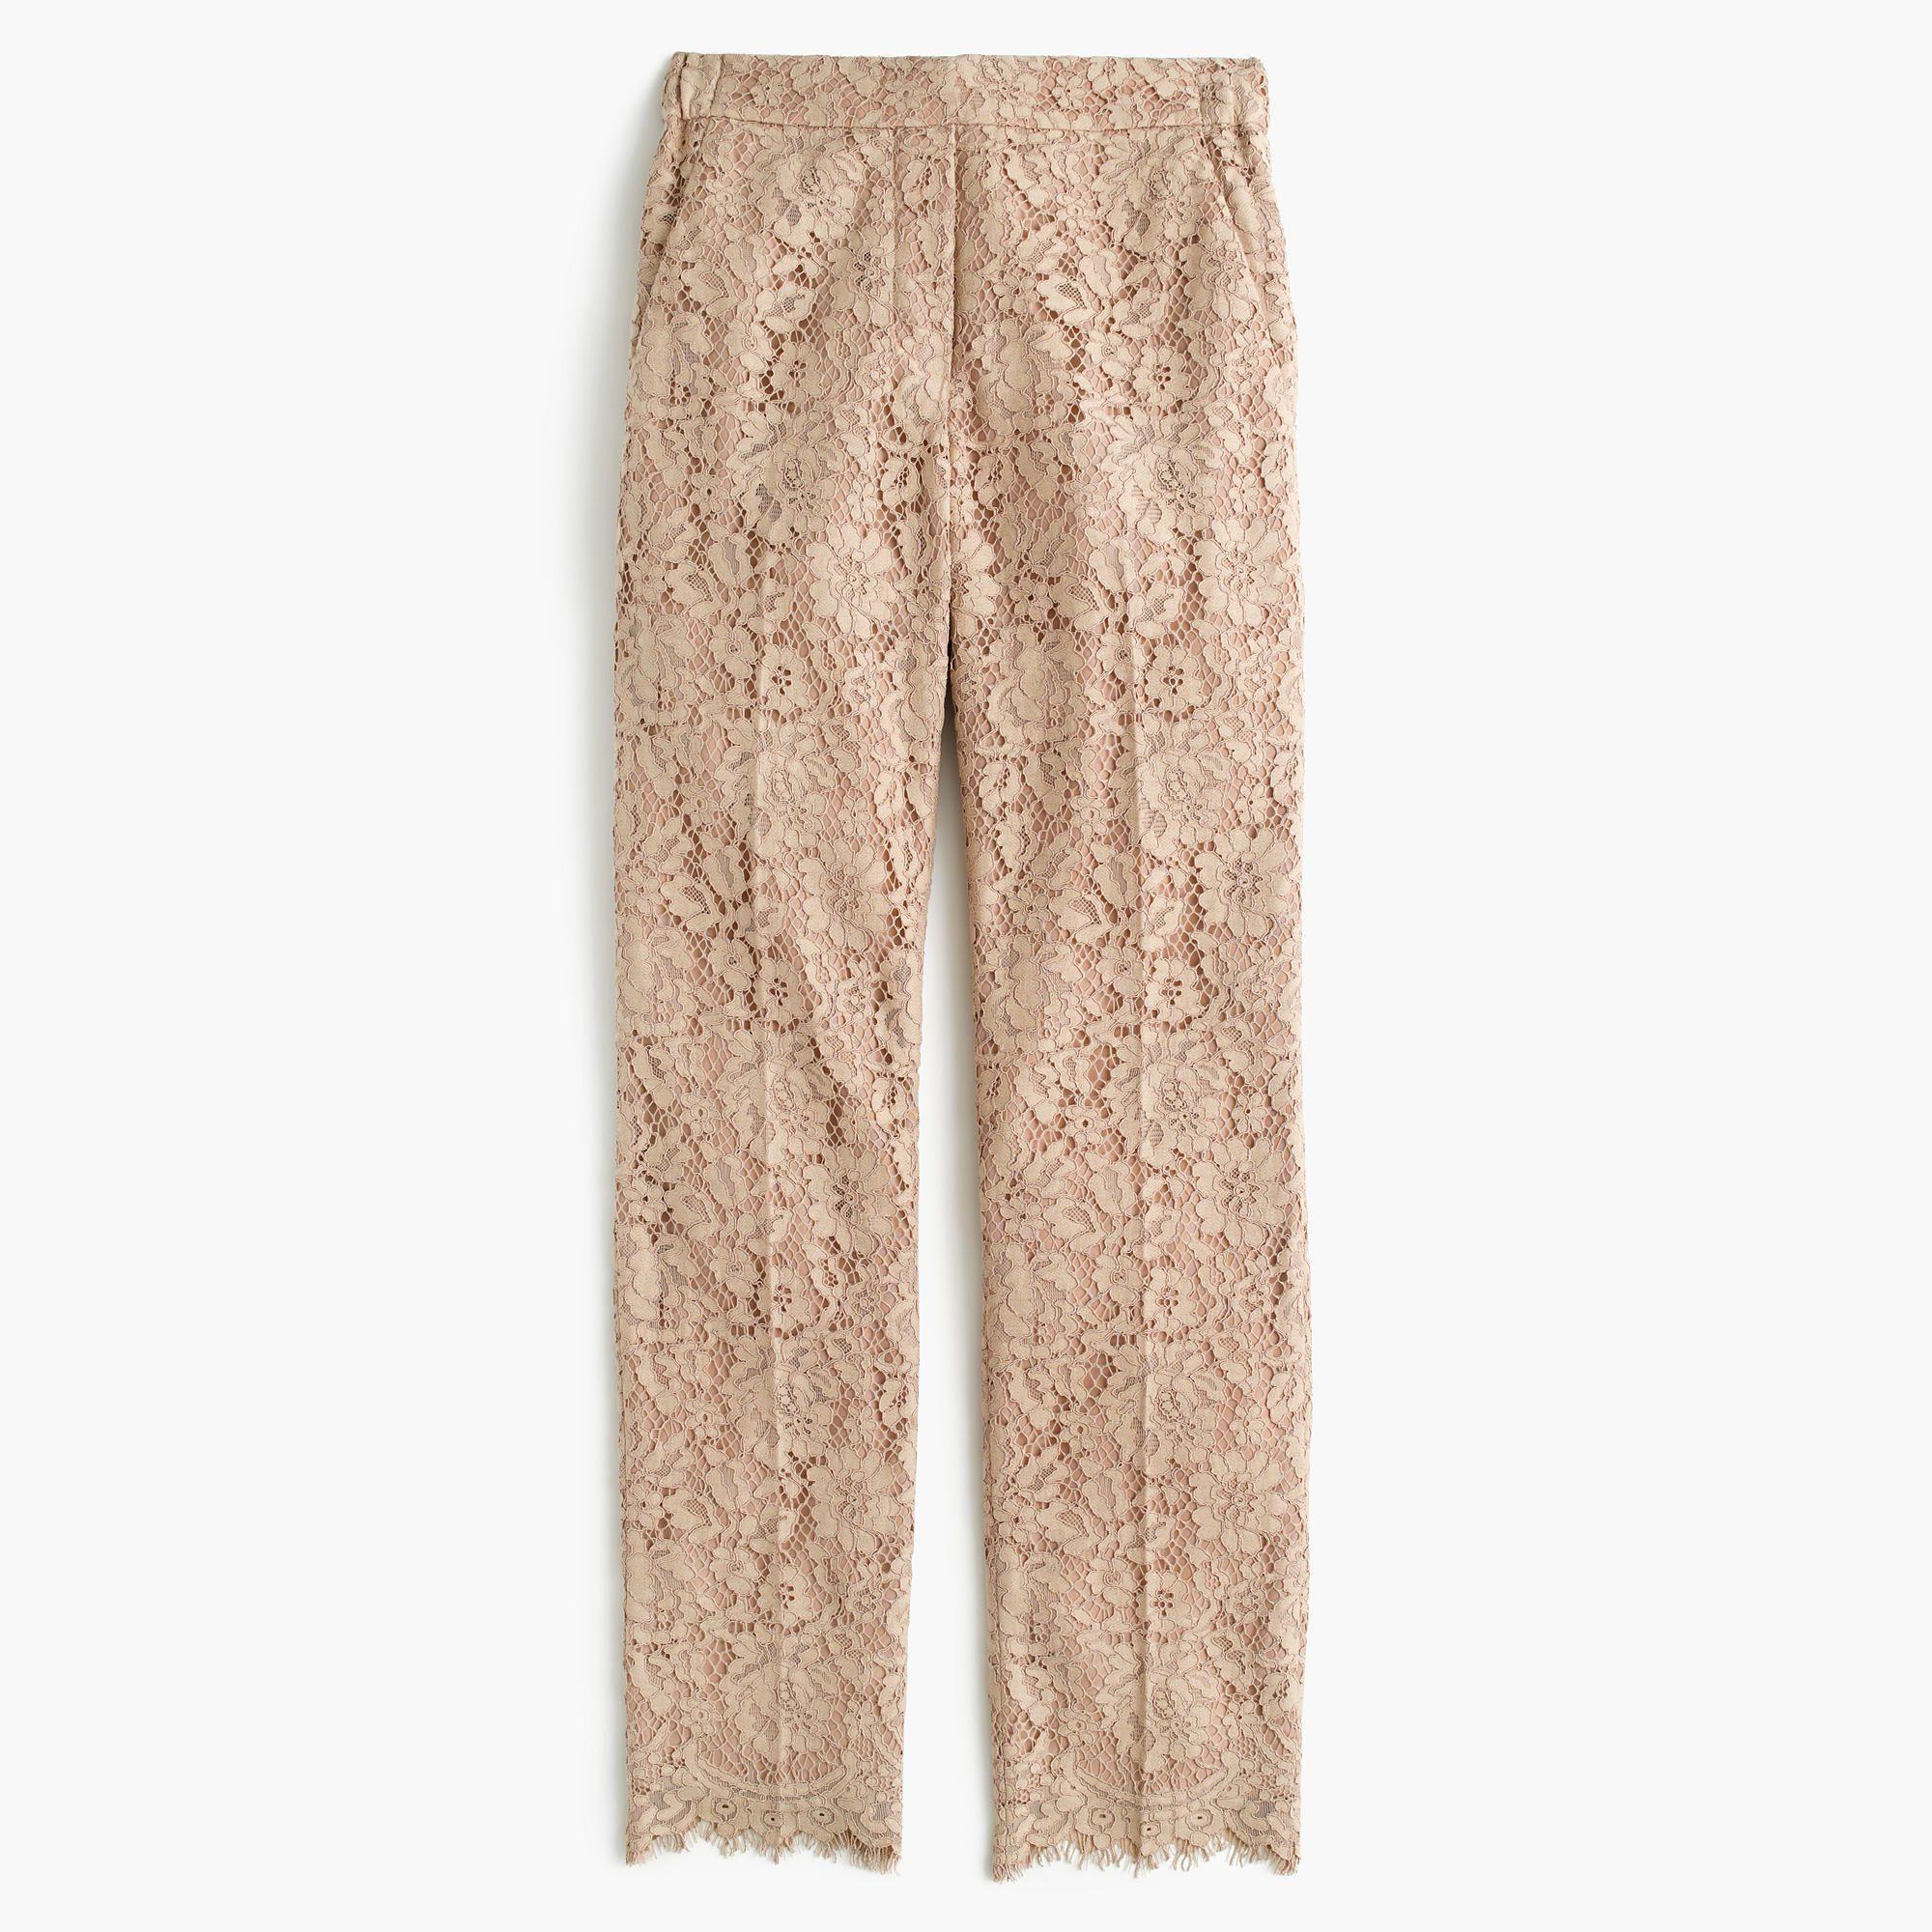 b1077c81 J.Crew - Petite lace pant   Work / Casual Outfits   Lace pants ...